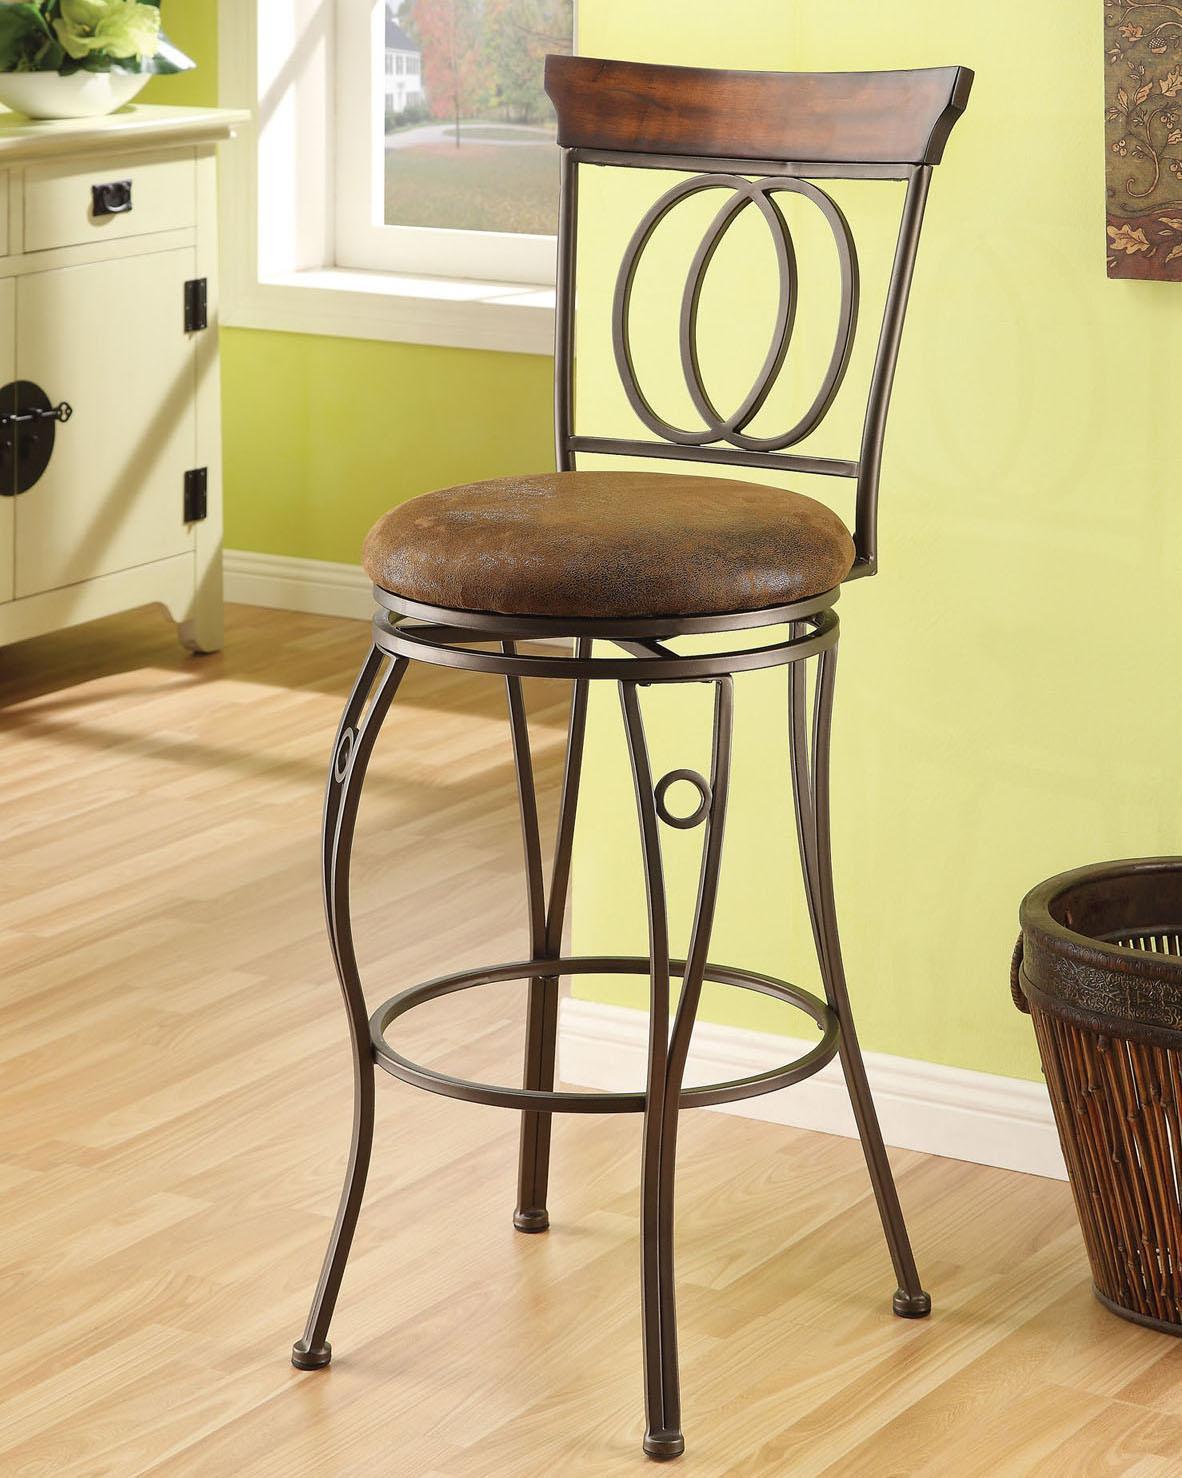 Acme Furniture Tavio Swivel Bar Chair - Item Number: 96046